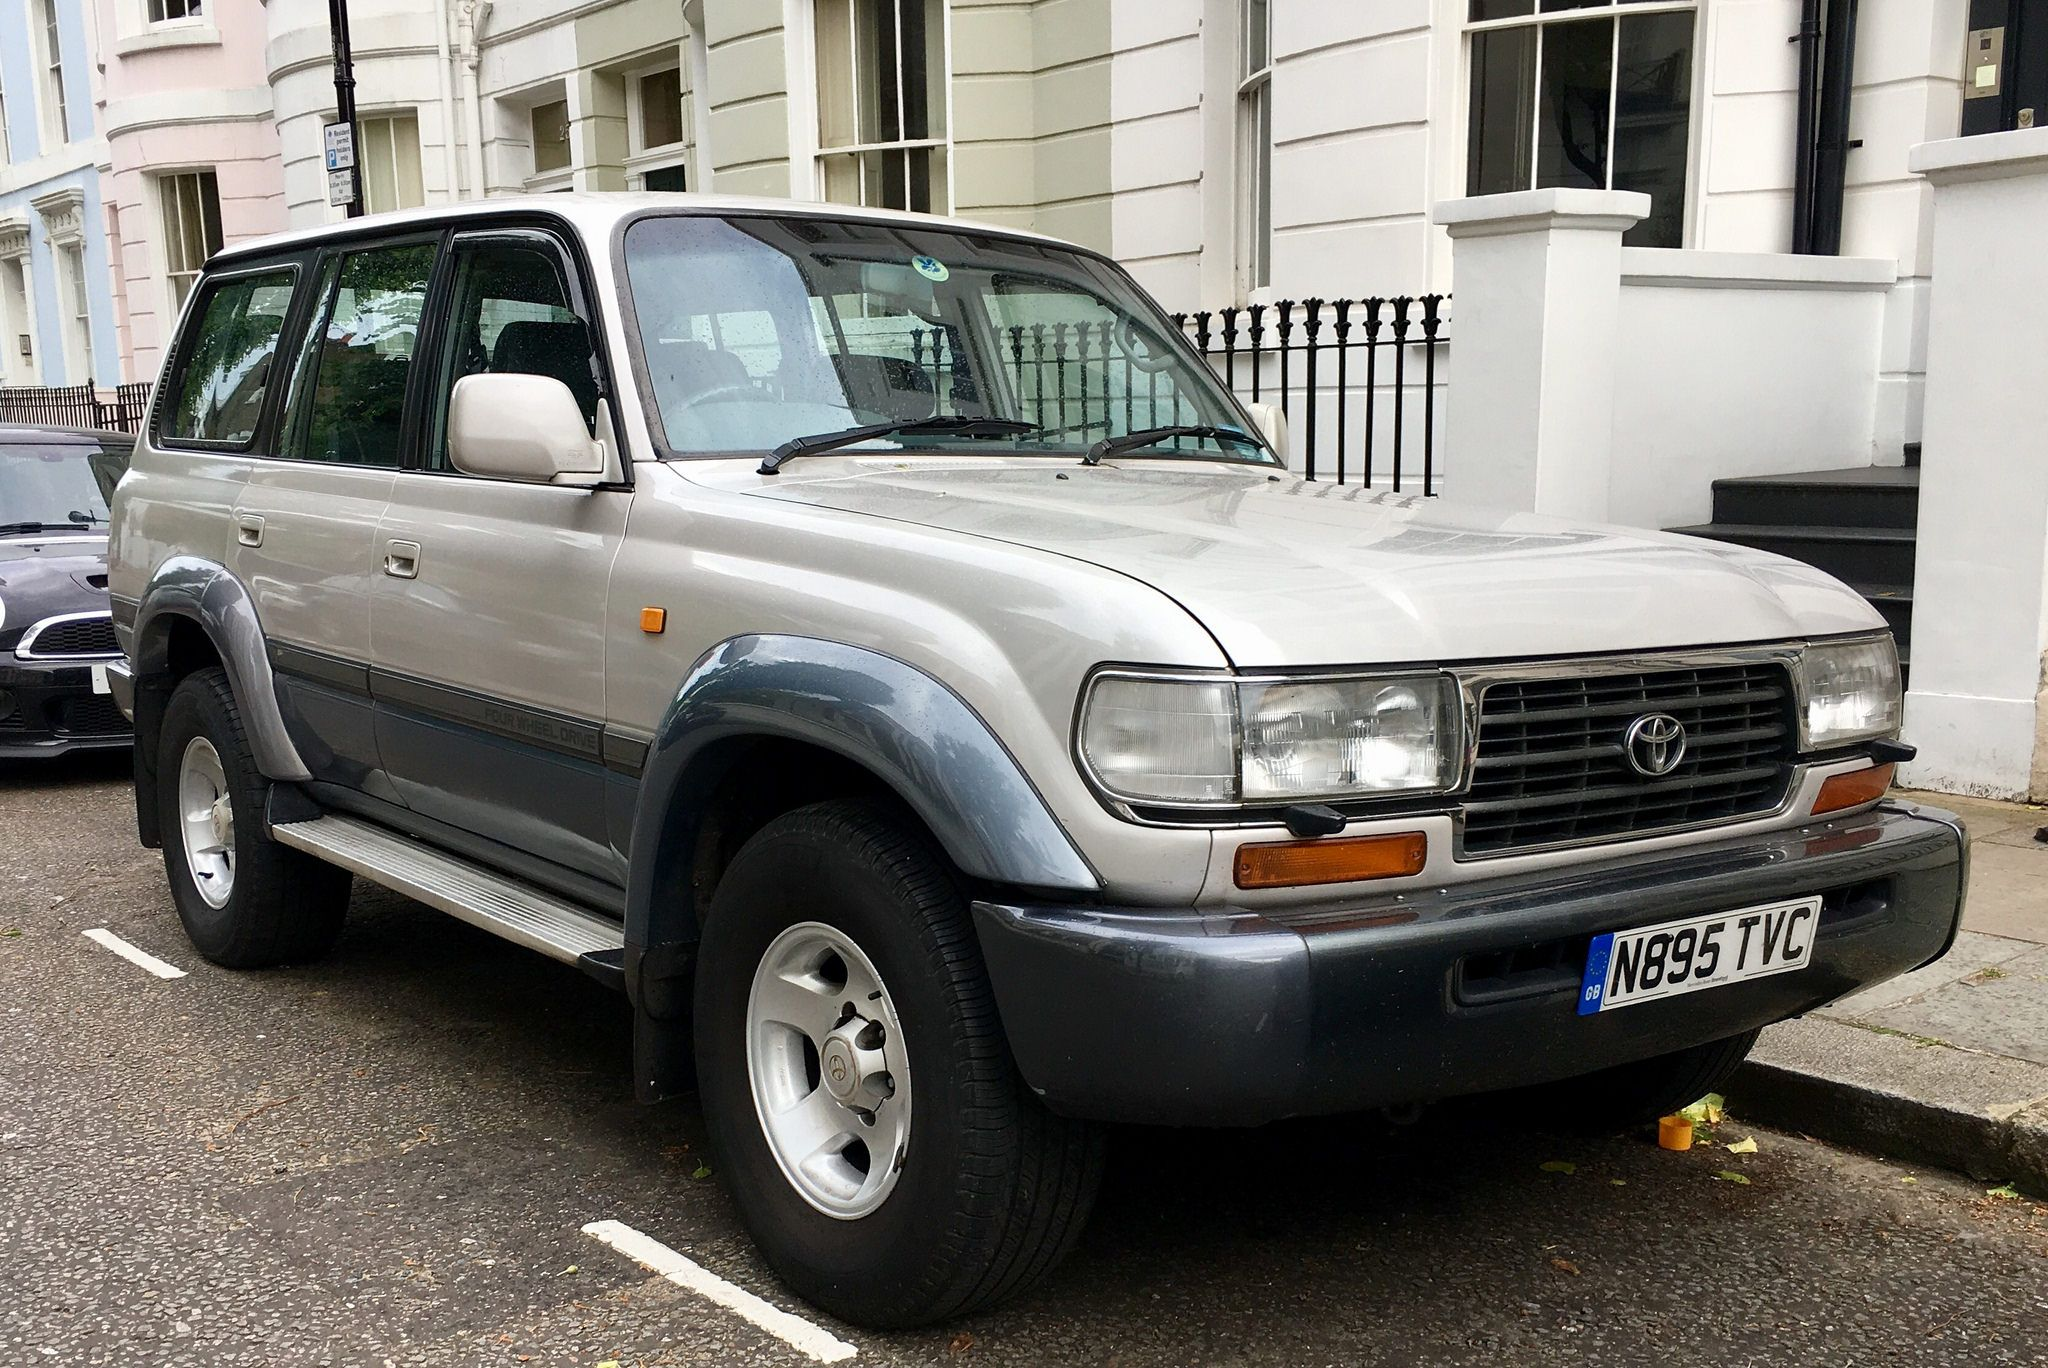 1995 Toyota Land Cruiser 4 2 V8 Diesel Toyota Land Cruiser Land Cruiser Toyota